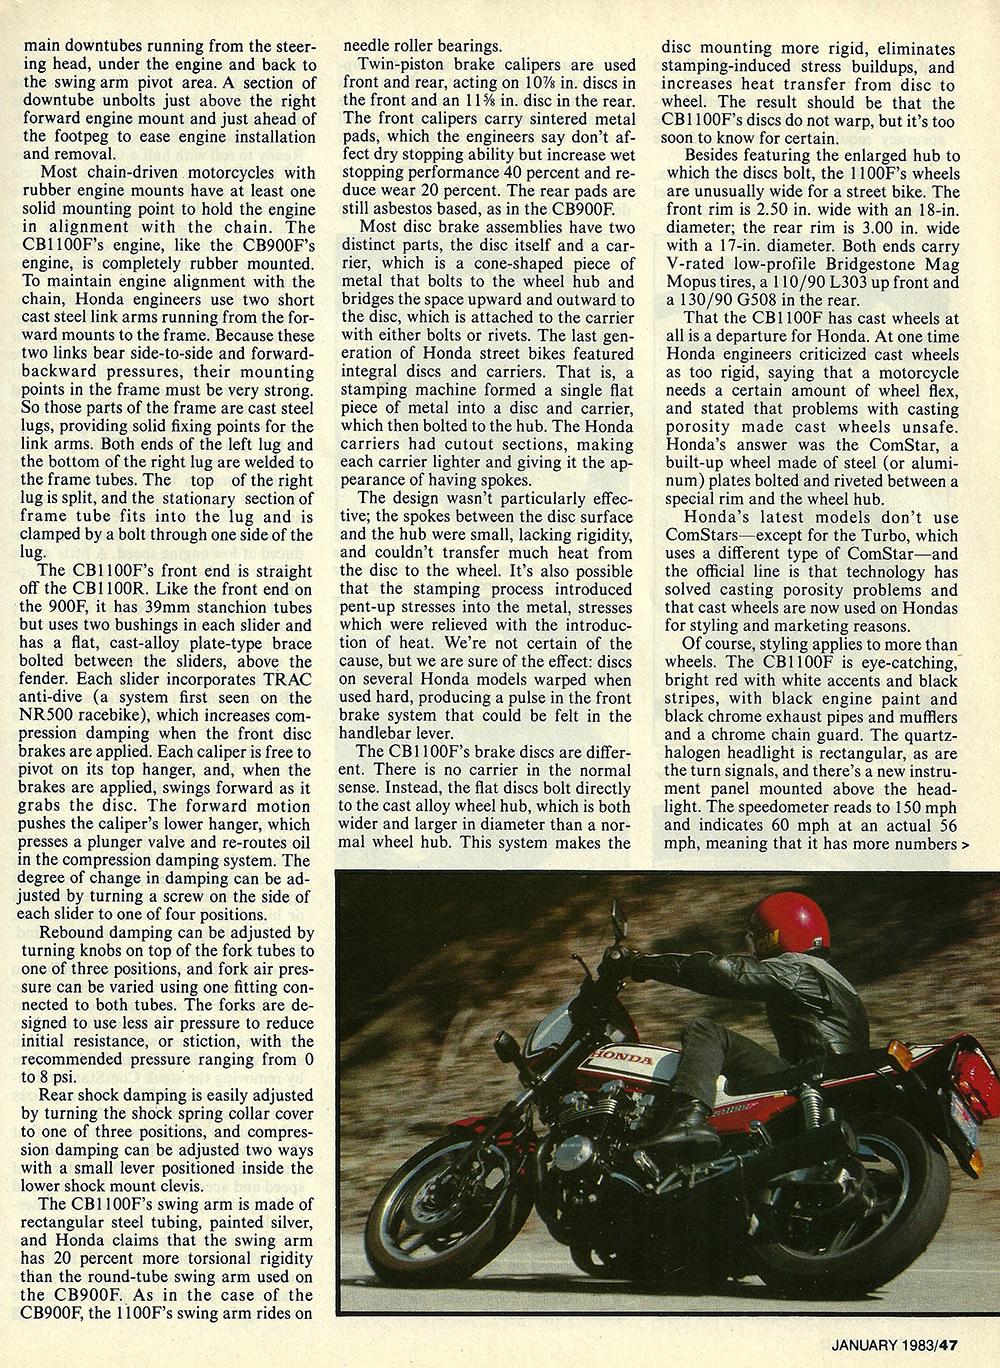 1983 Honda CB1100F road test 04.jpg